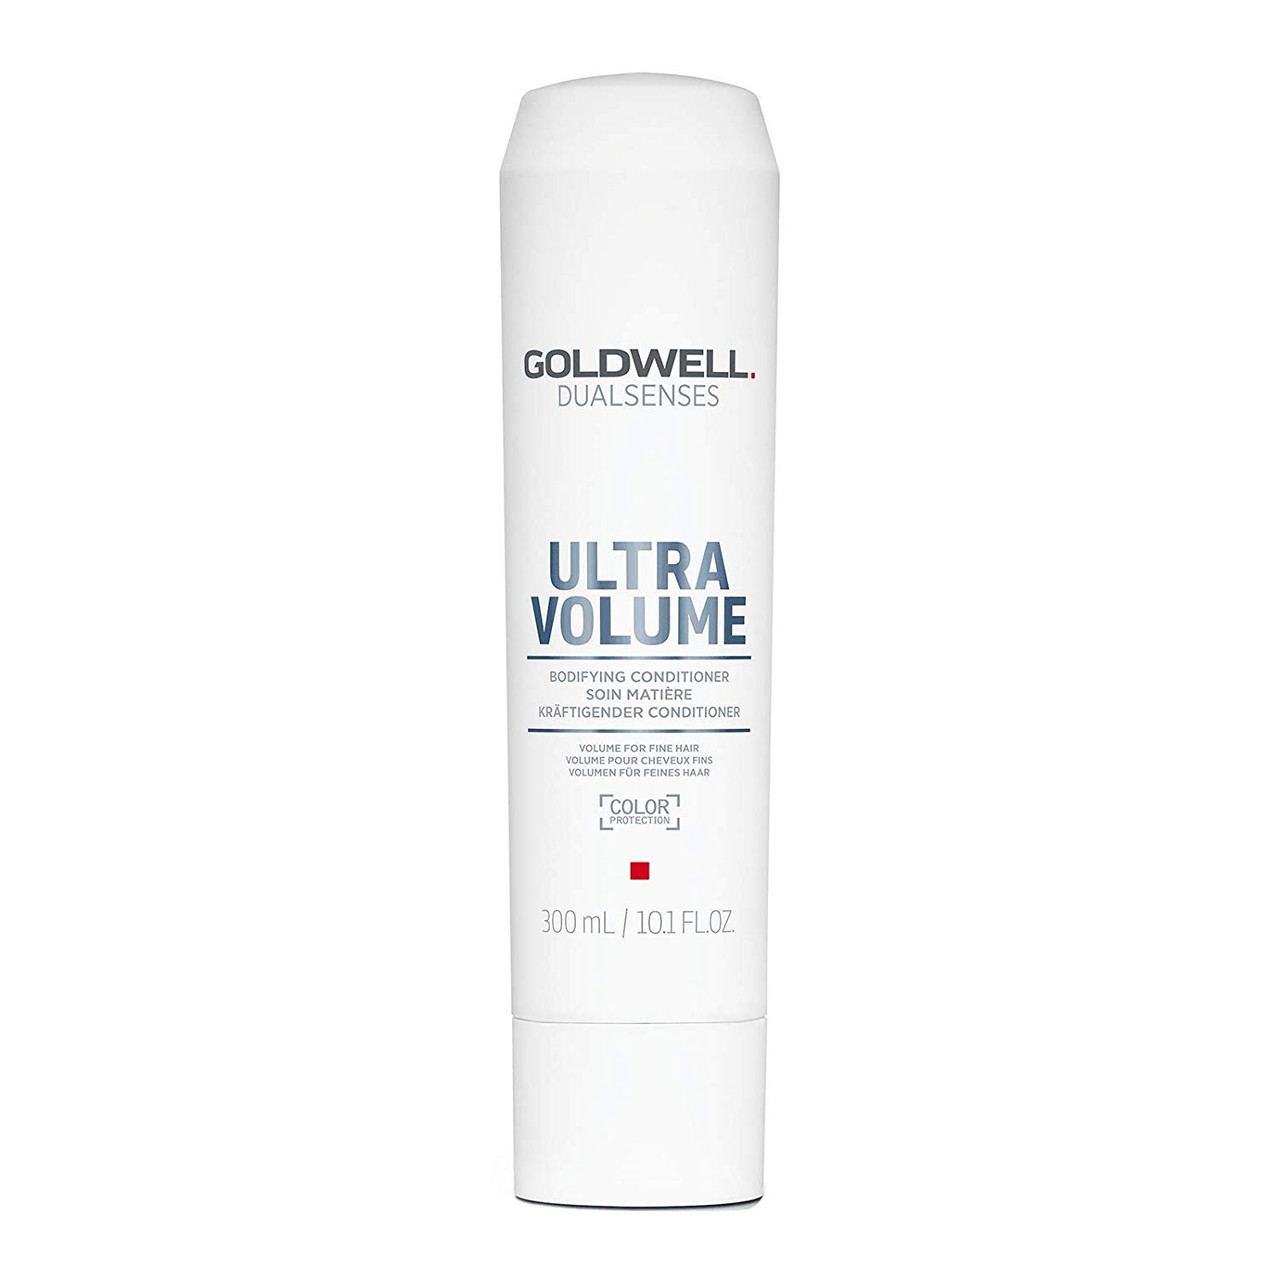 Goldwell Dualsenses Ultra Volume Bodifying Conditioner 10.1 oz